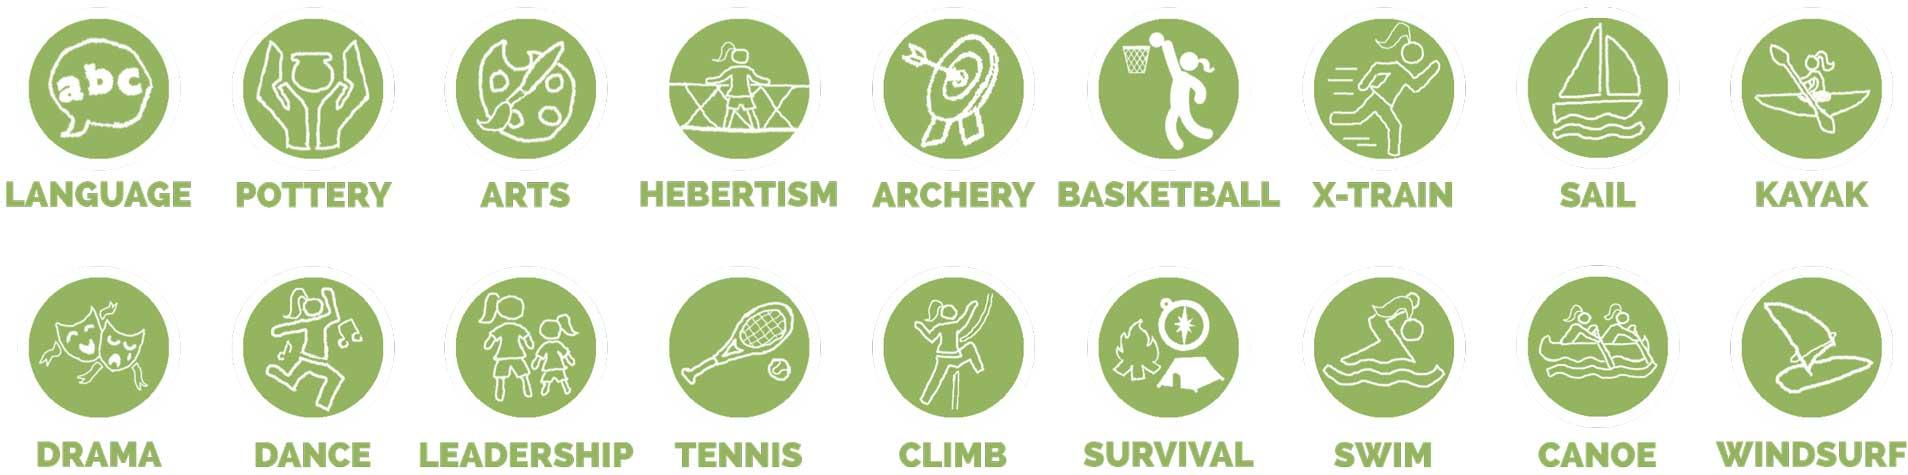 Activities offered: language; pottery; arts; hebertism; archery; basketball; cross-train; sail; kayak; drama; dance; leadership; tennis; climb; survival; swim; canoe; windsurf